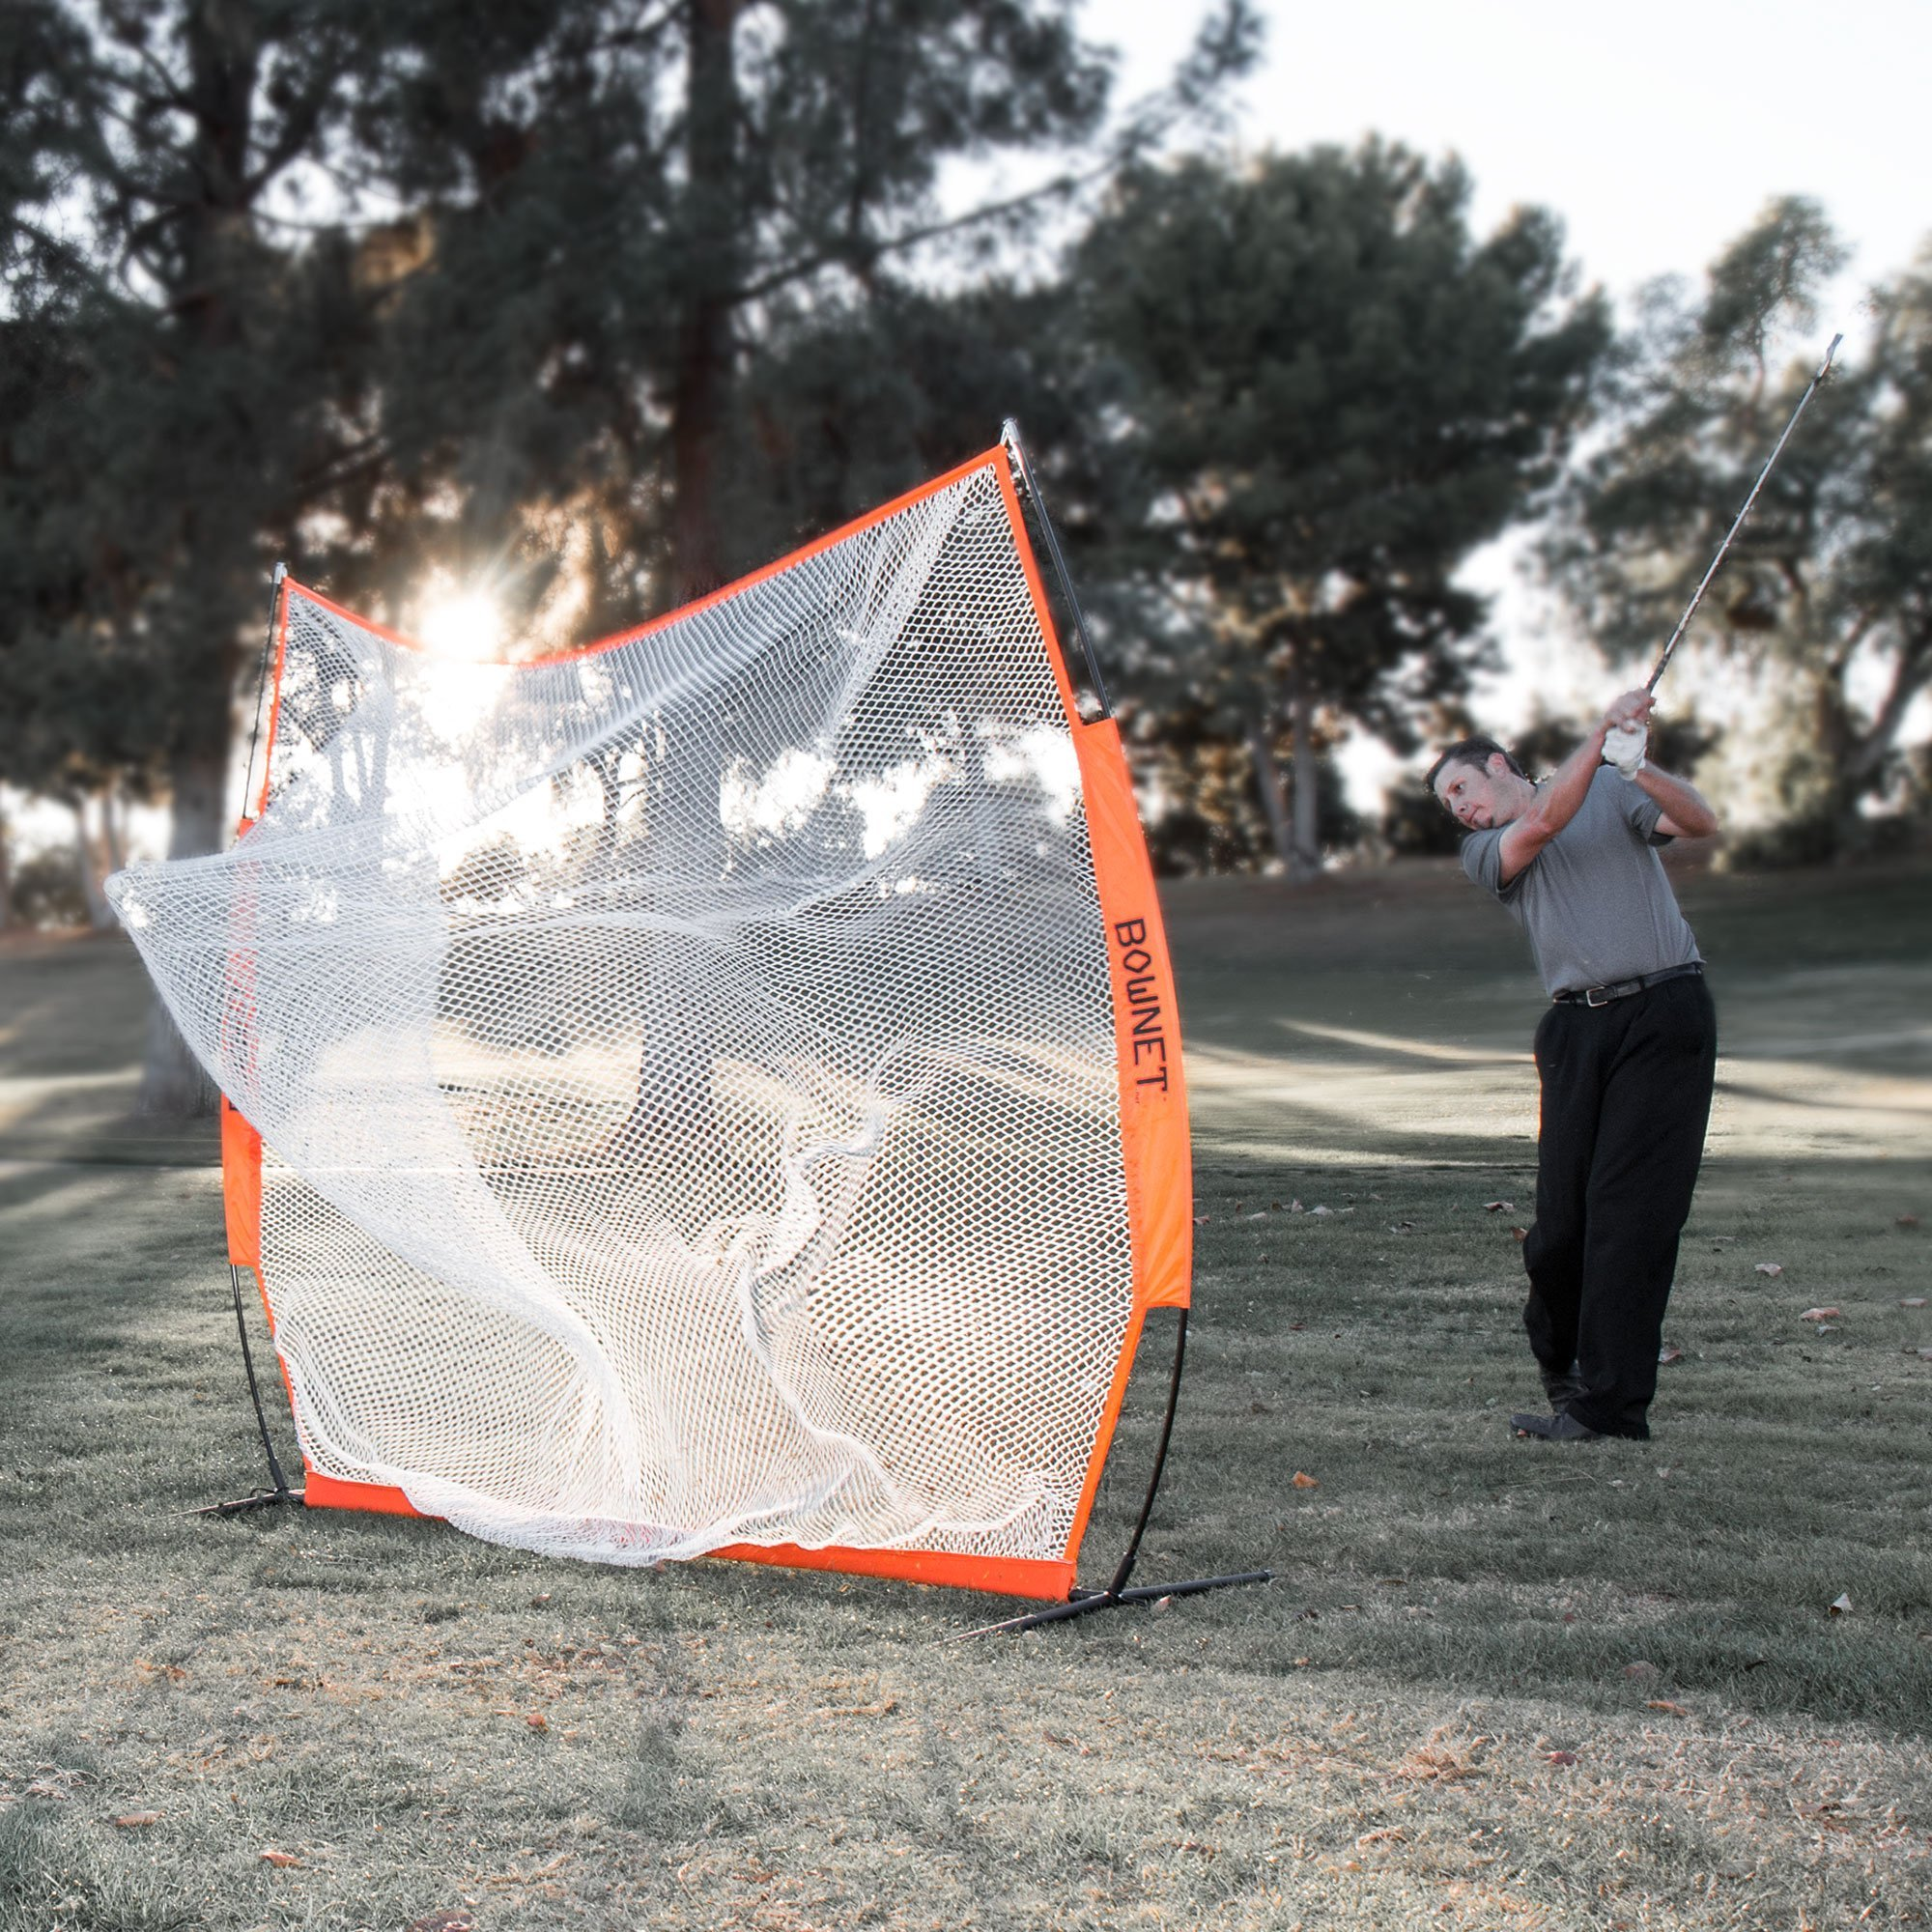 Bownet 7' x 7' Portable Golf Hitting Practice Net (Net Only)